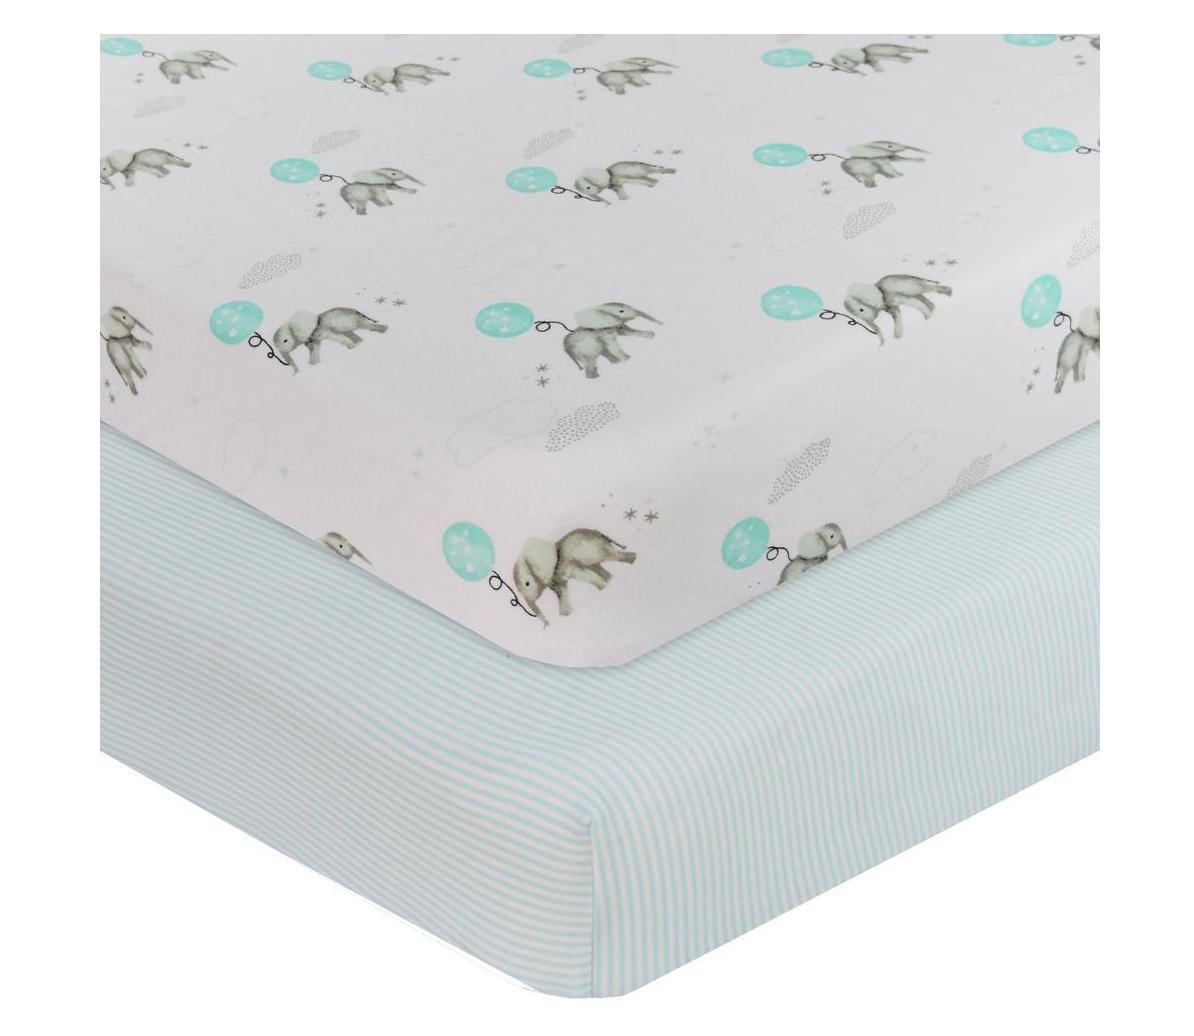 Cot mattress sheets